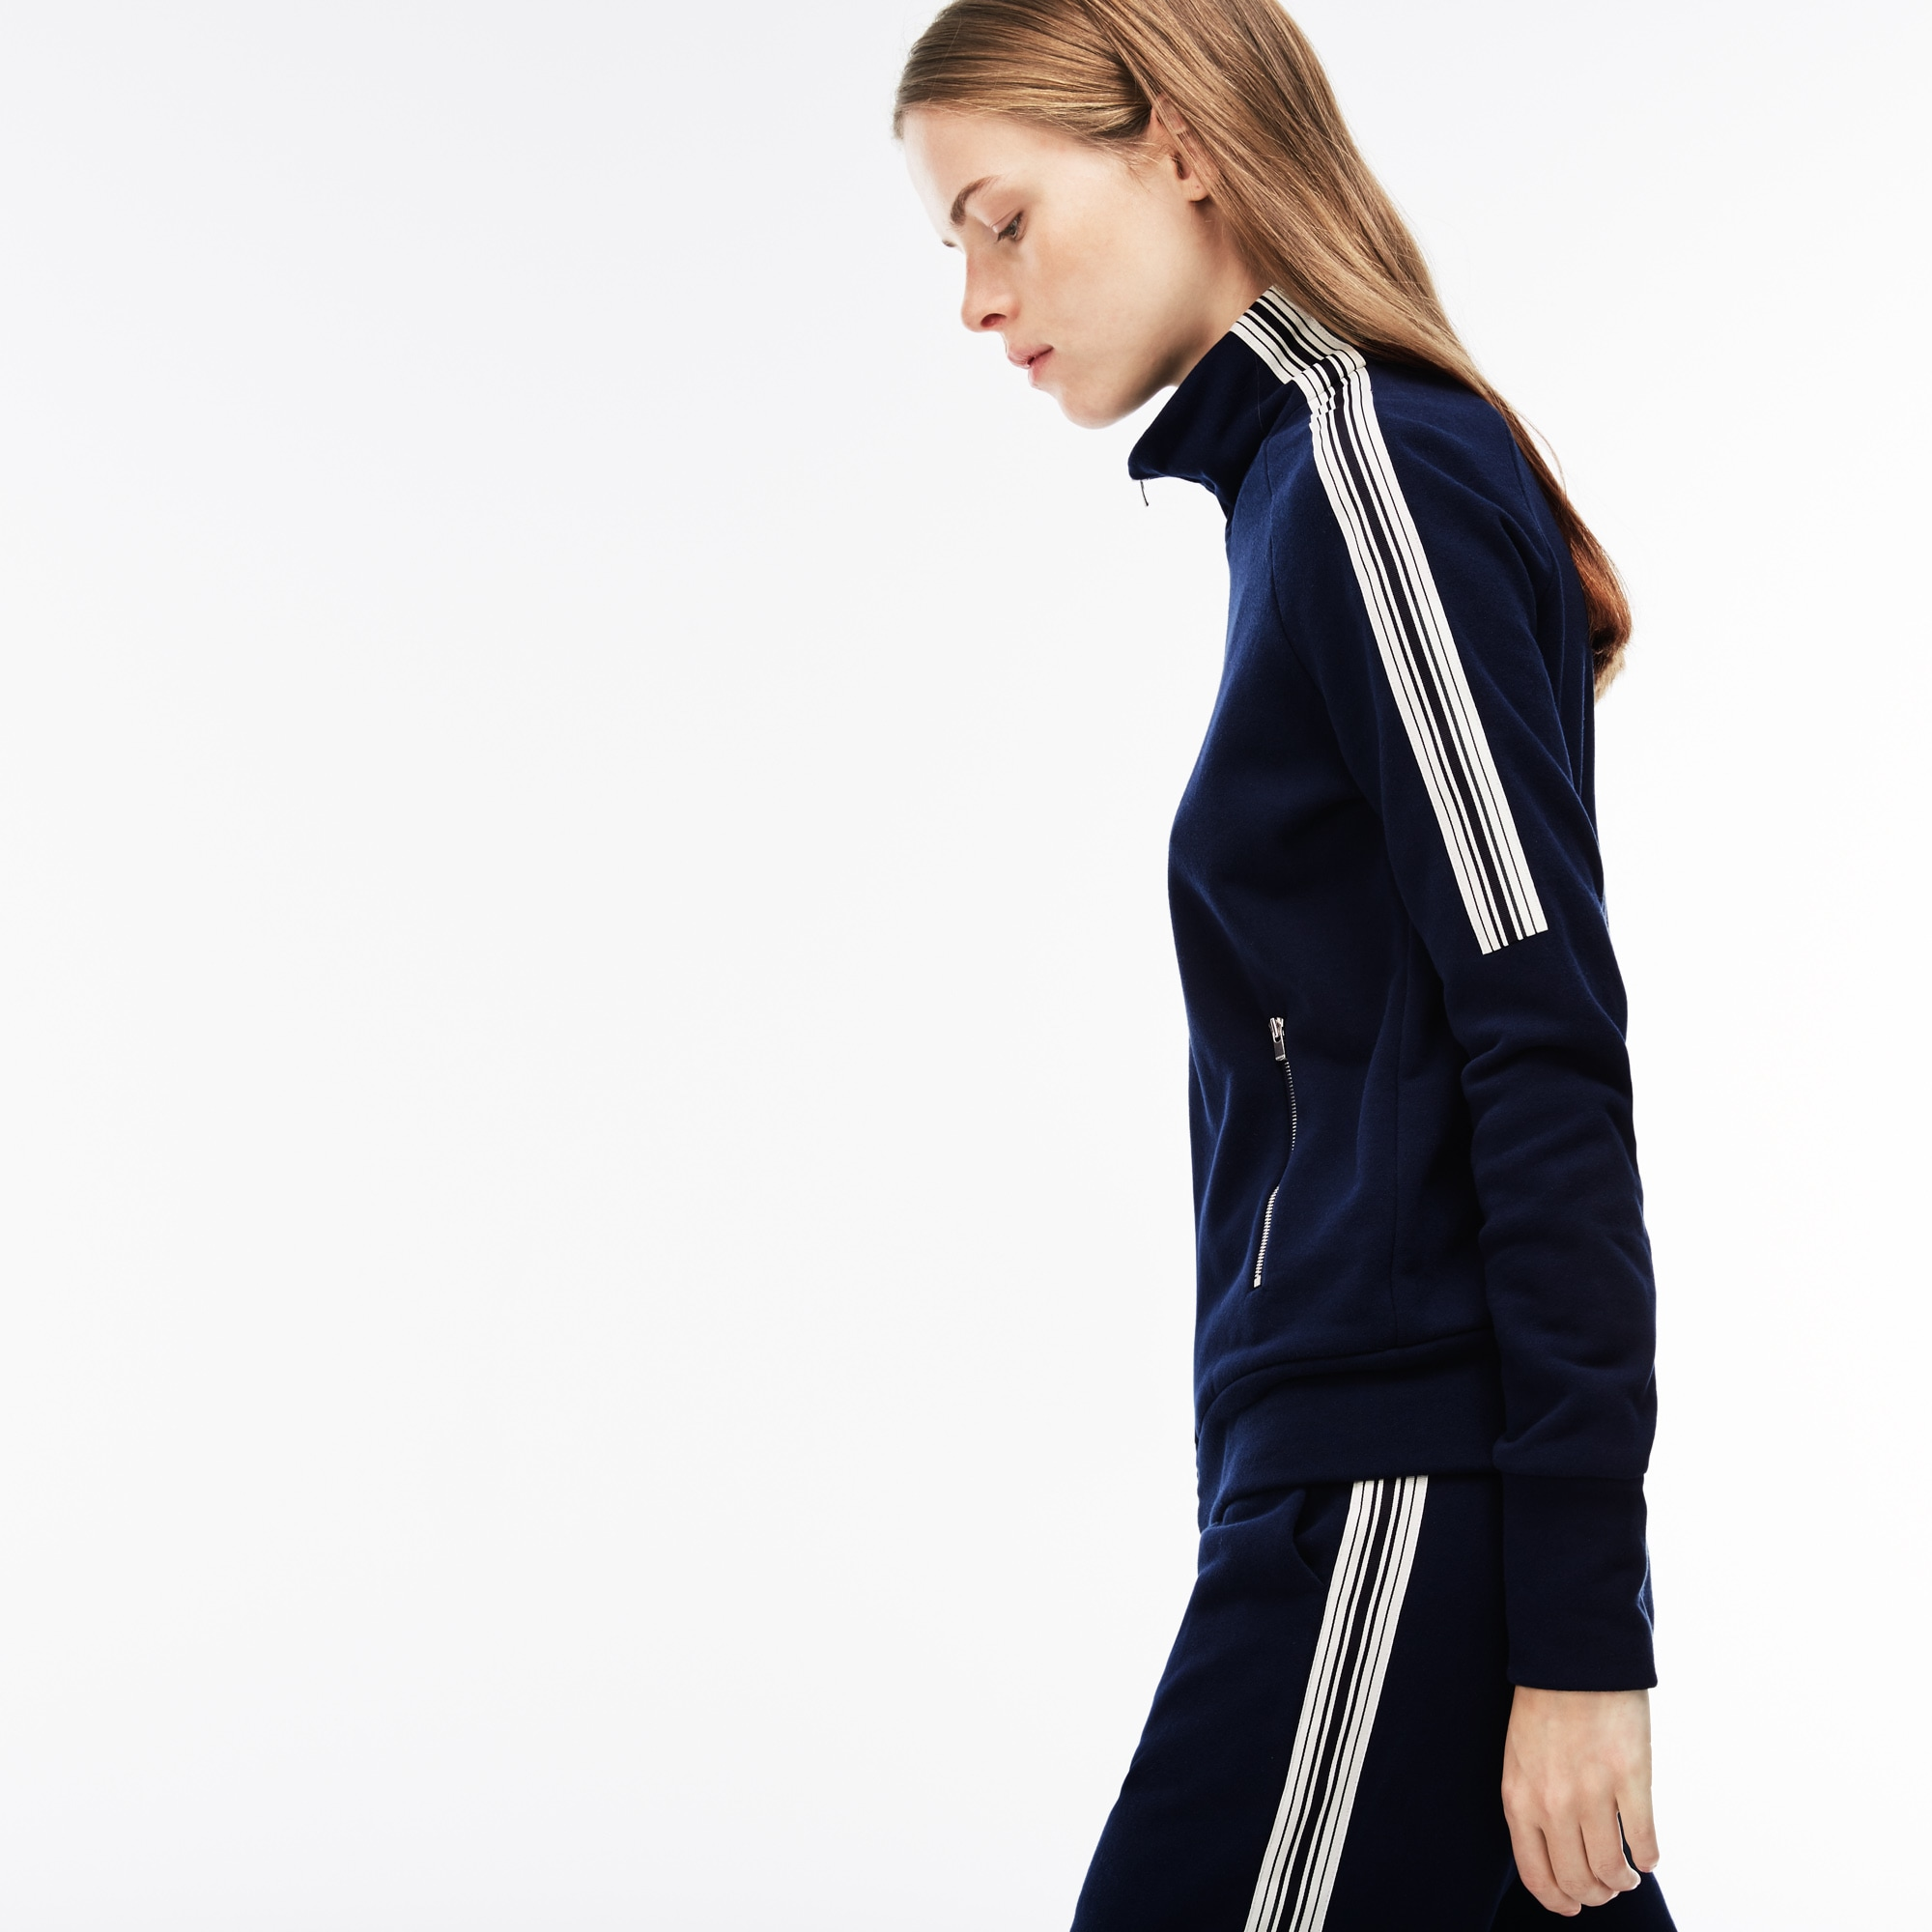 Damen-Sweatshirt aus Krepp-Fleece mit Reißverschluss